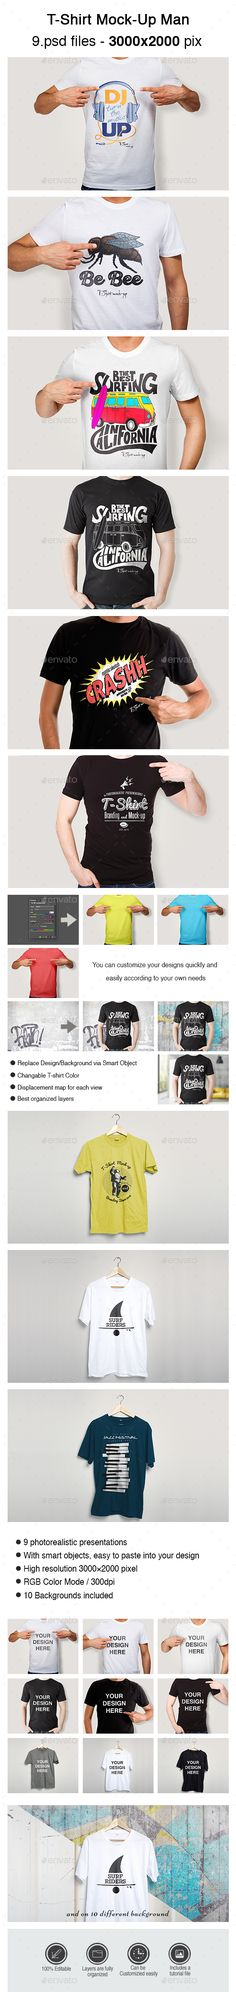 T-Shirt Mock-Up Man #design Download: http://graphicriver.net/item/tshirt-mockup-man/14318590?ref=ksioks